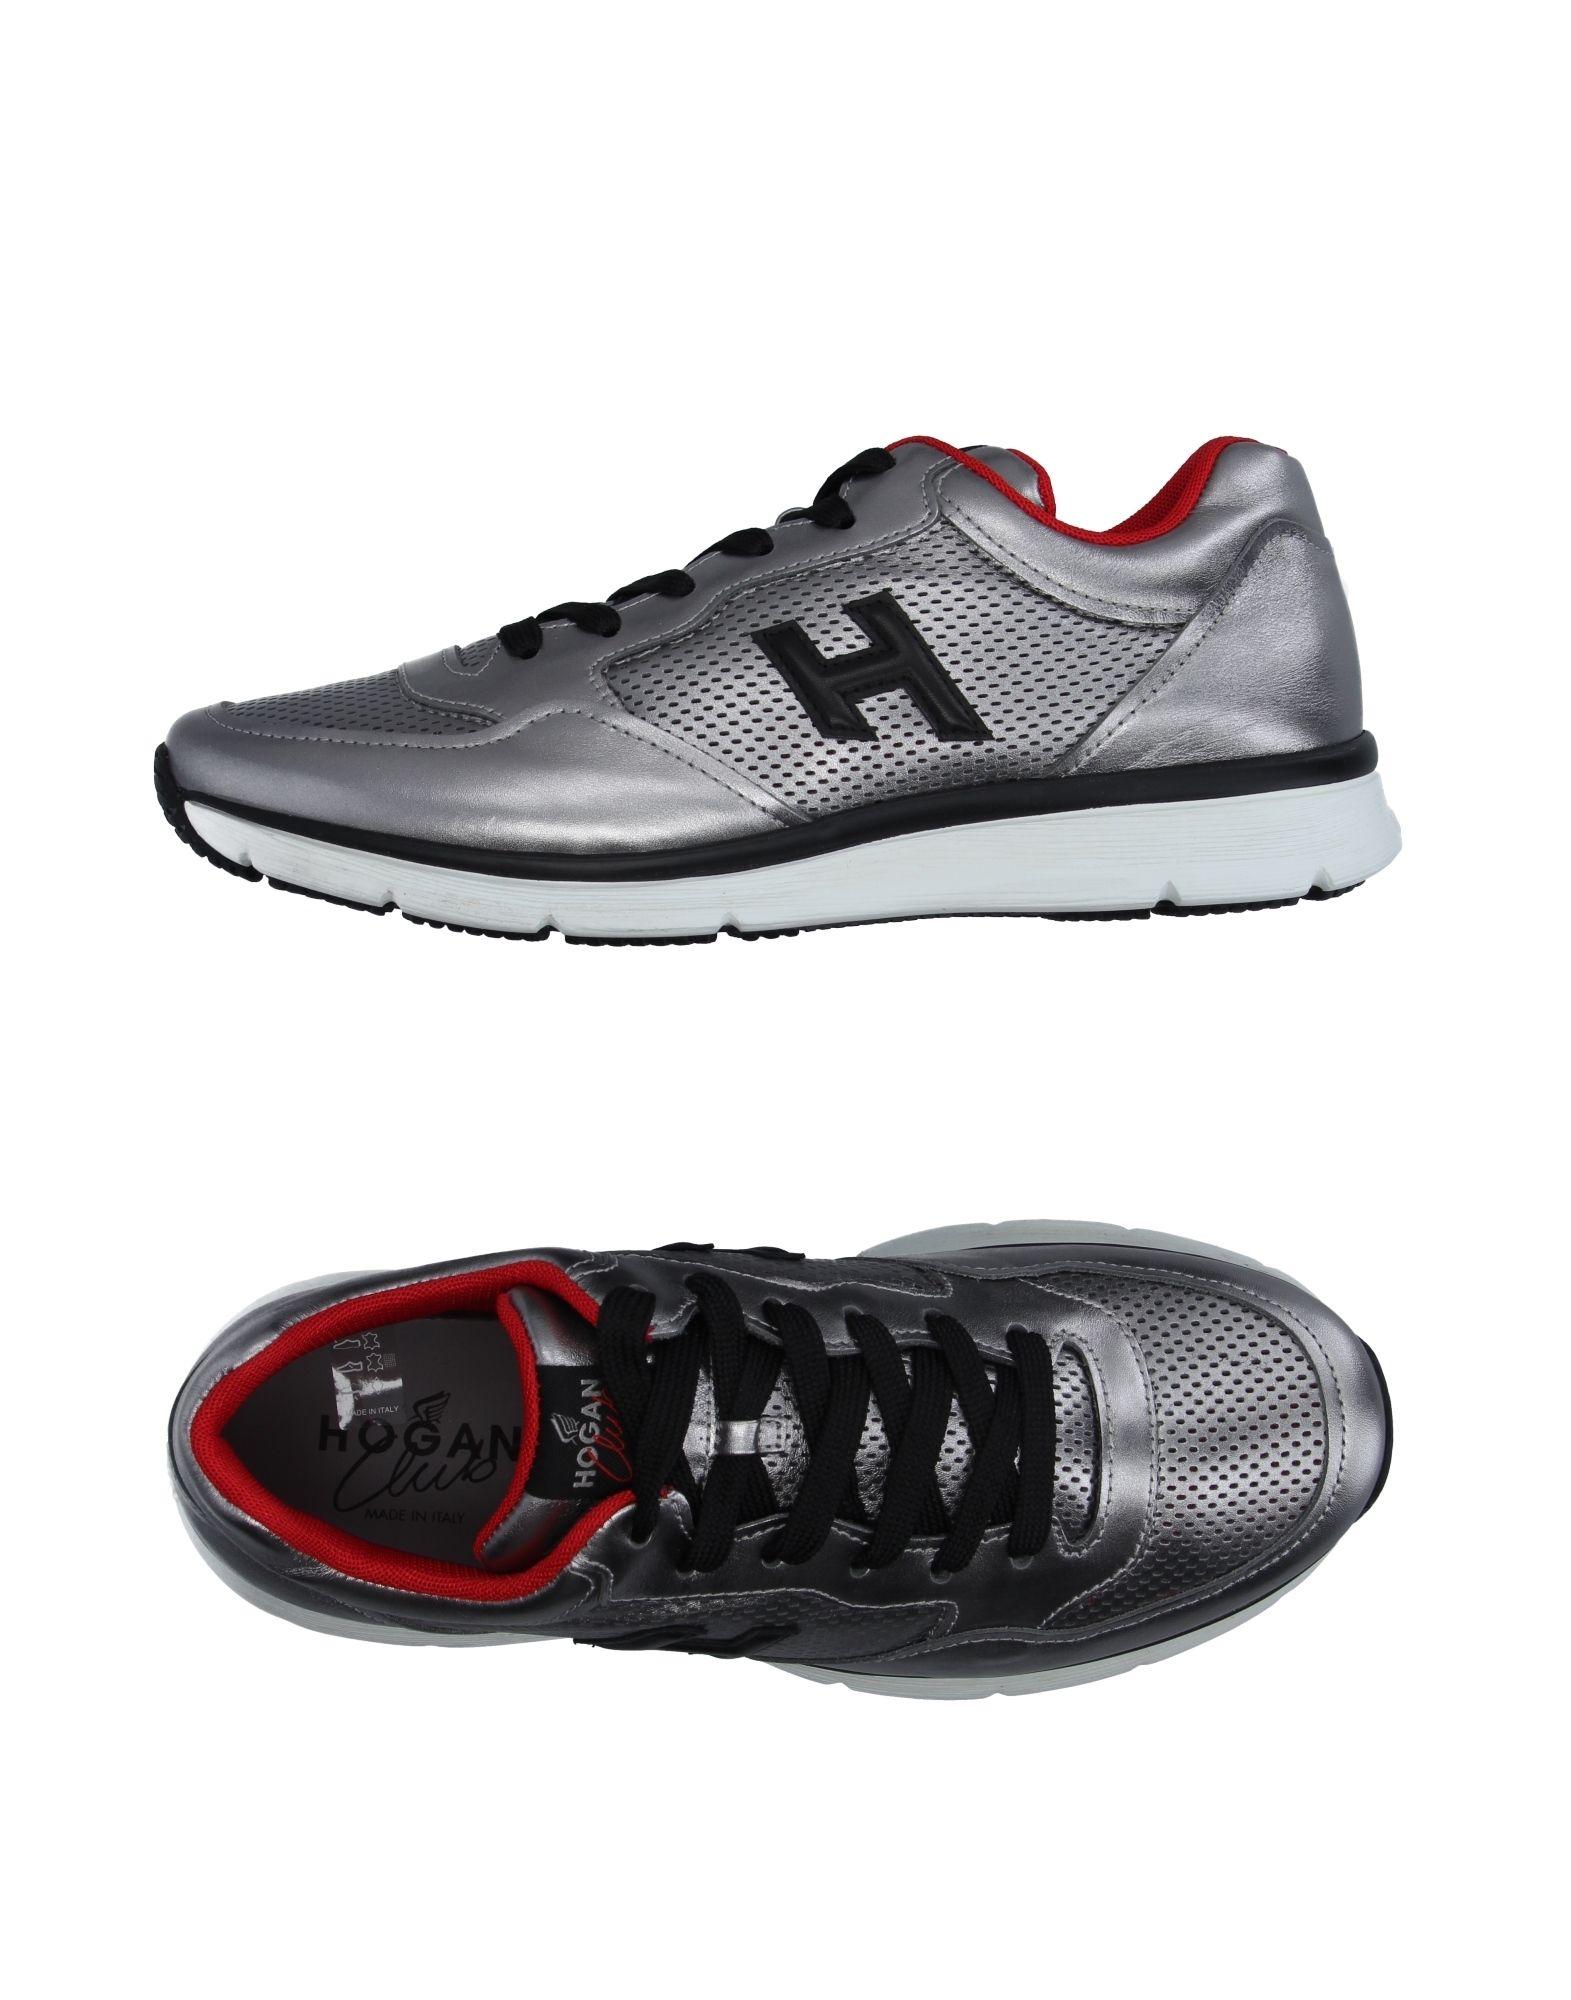 Hogan Sneakers Herren  11175276GT Gute Qualität beliebte Schuhe